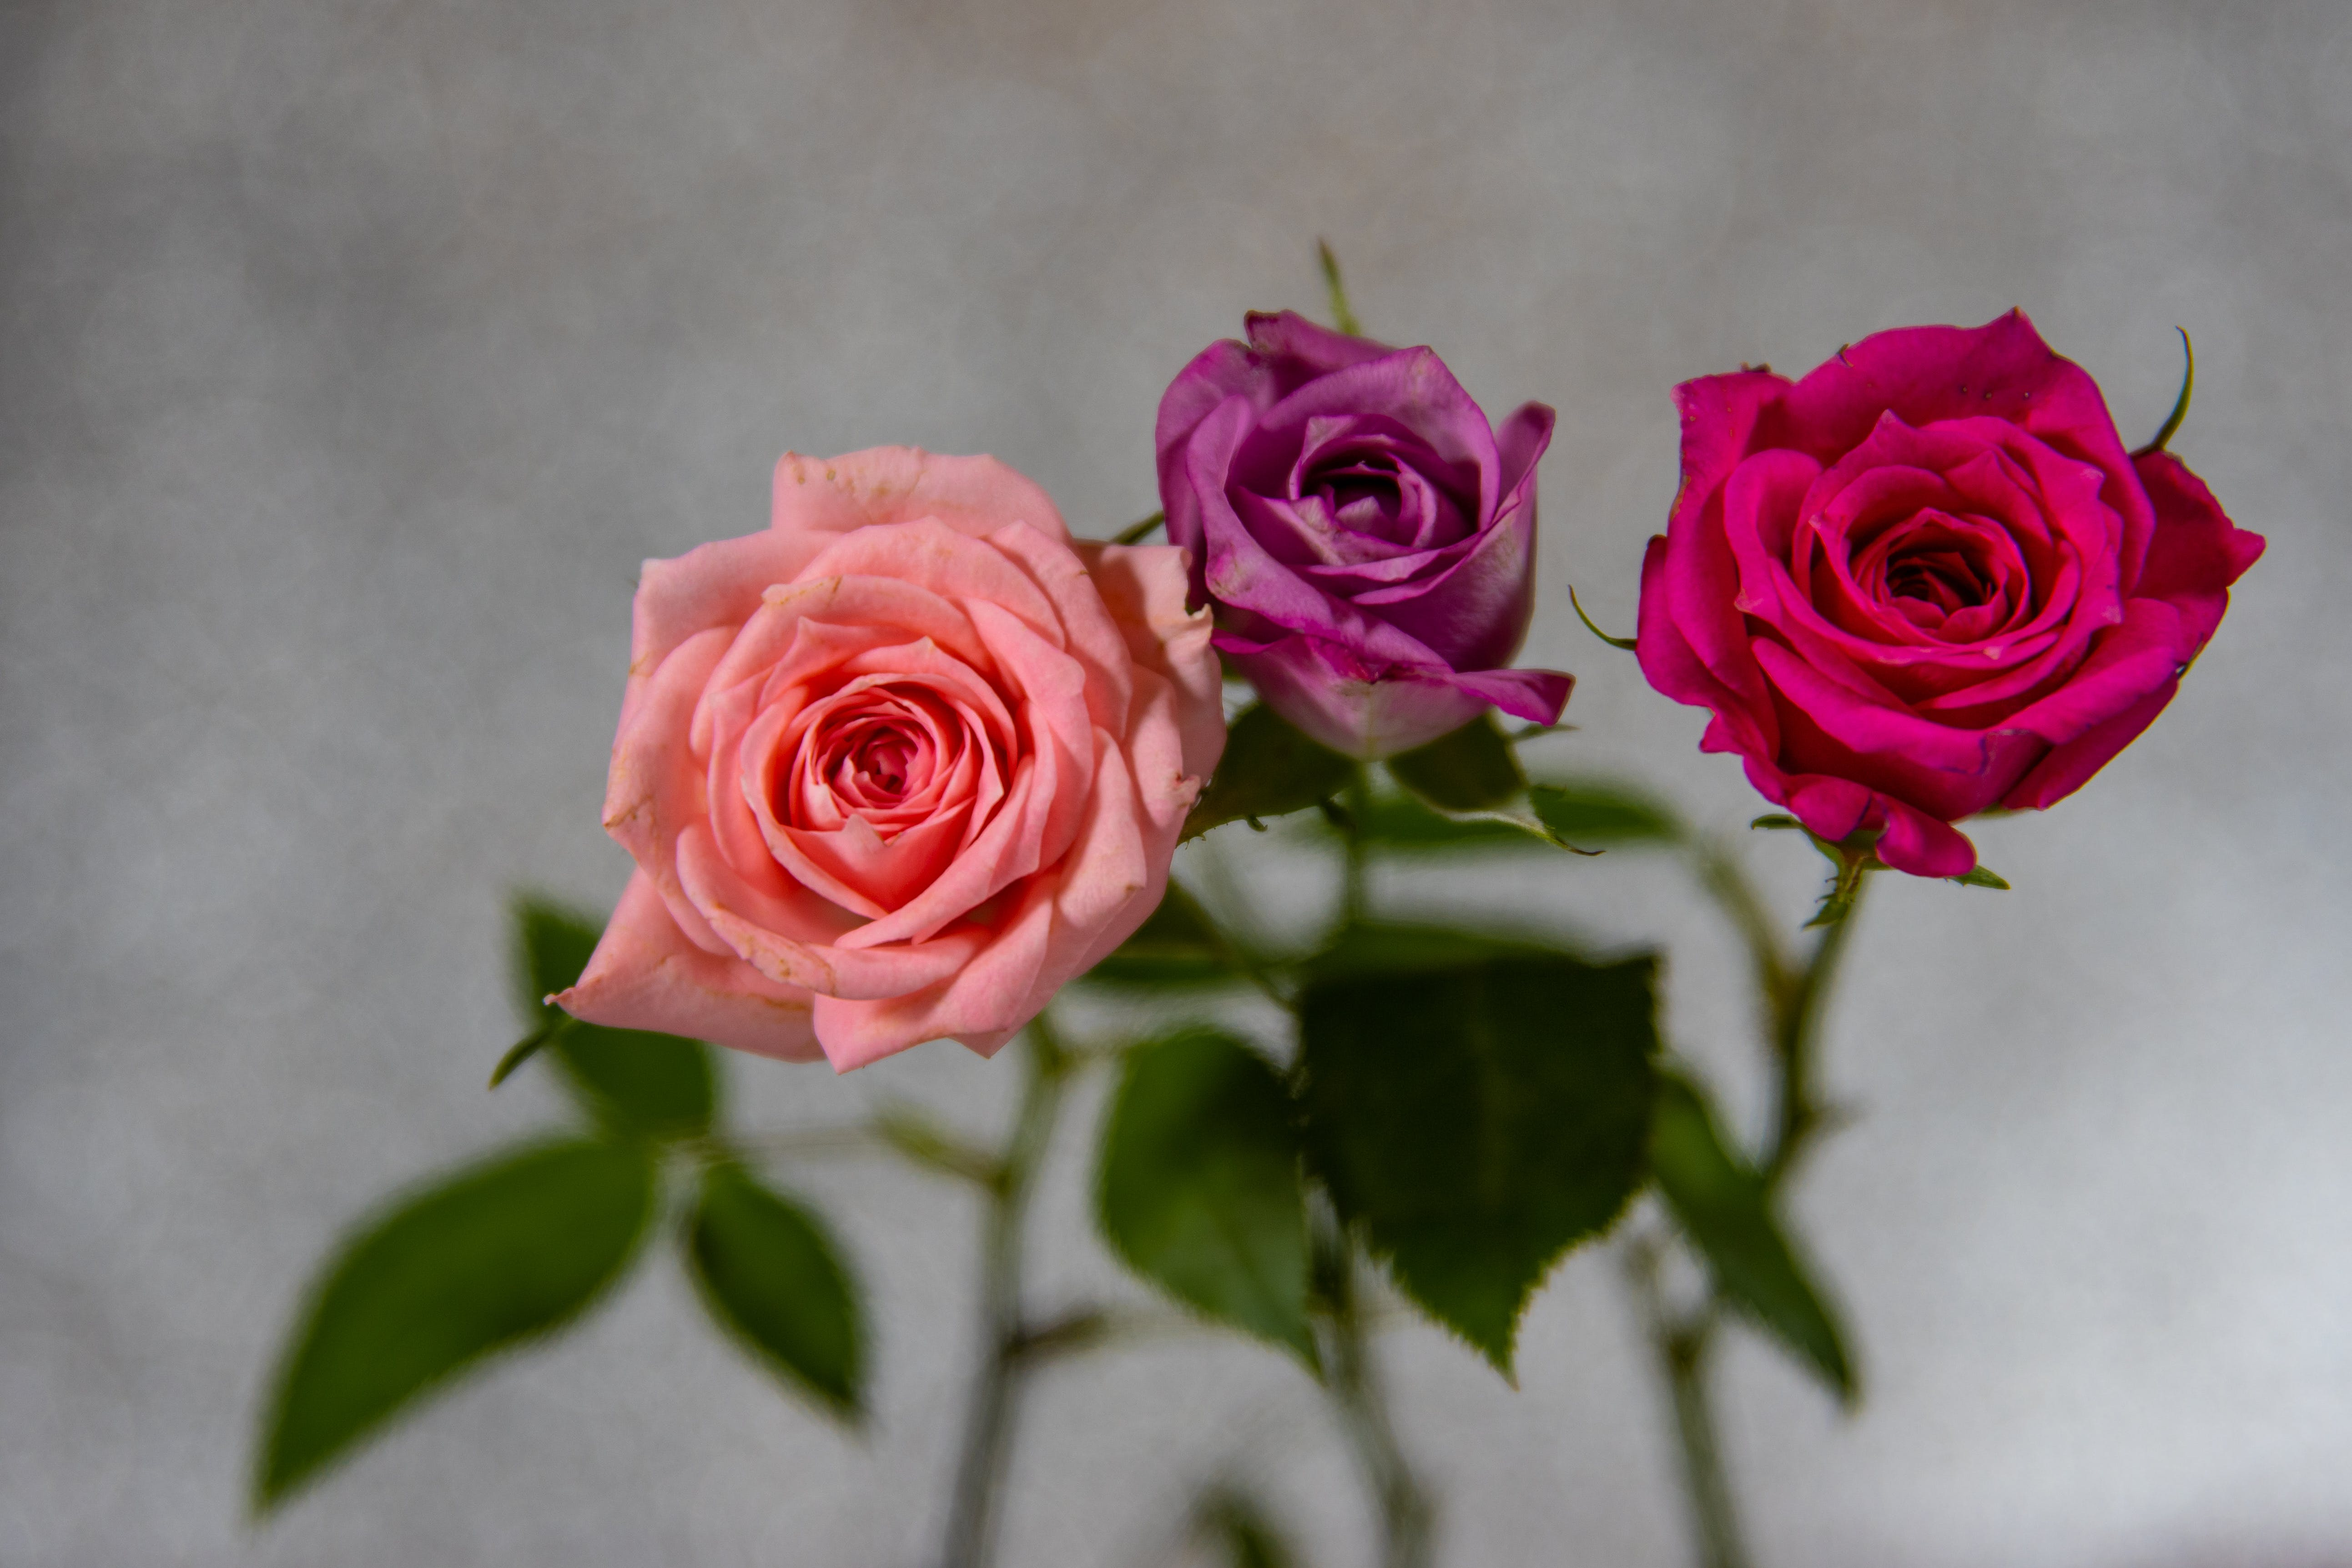 Close-Up Photo of Three Roses